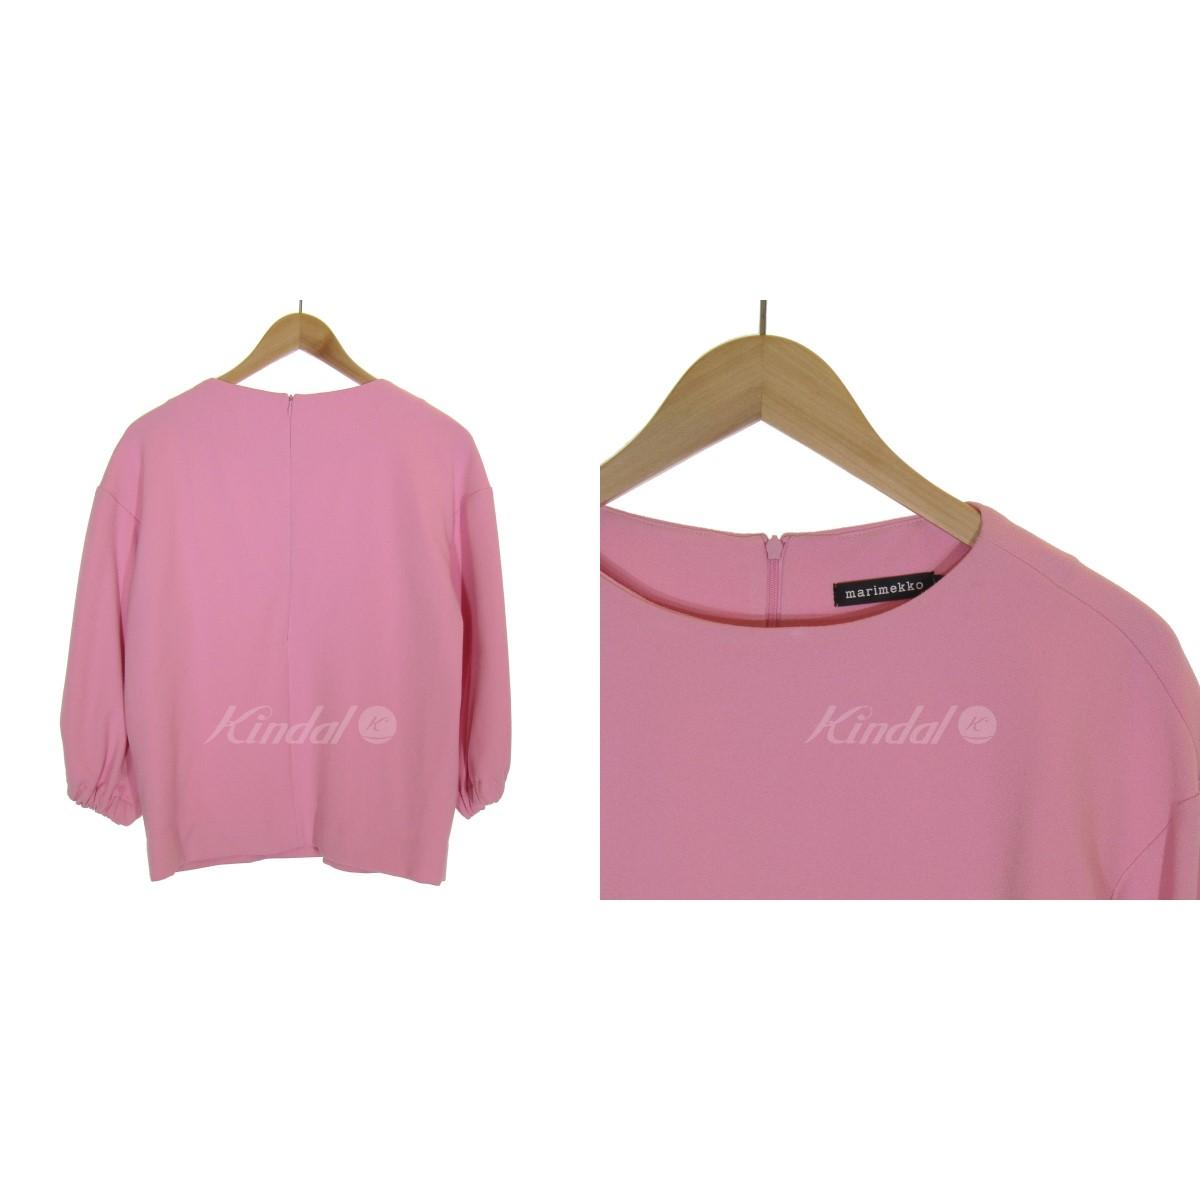 marimekkoEMILIANA SHIRT ブラウス ピンク サイズ 340XOkNwP8n